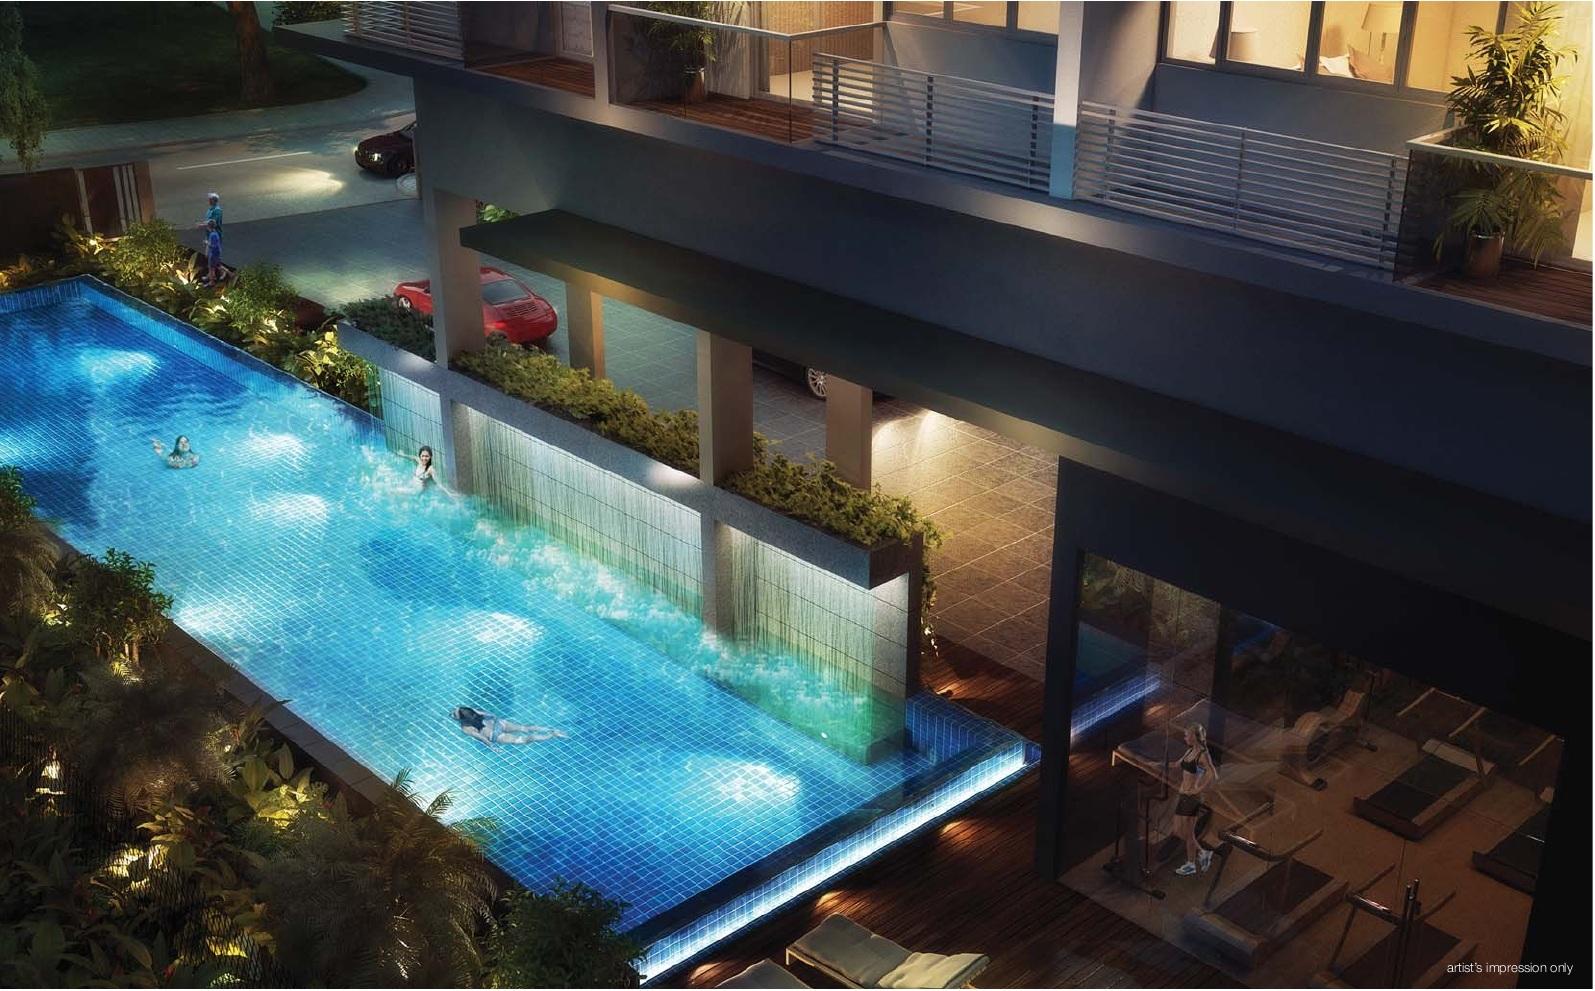 Laverne's Loft Pool lavernes loft Lavernes Loft Singapore   Showflat Hotline +65 61007122 lavernes loft pool